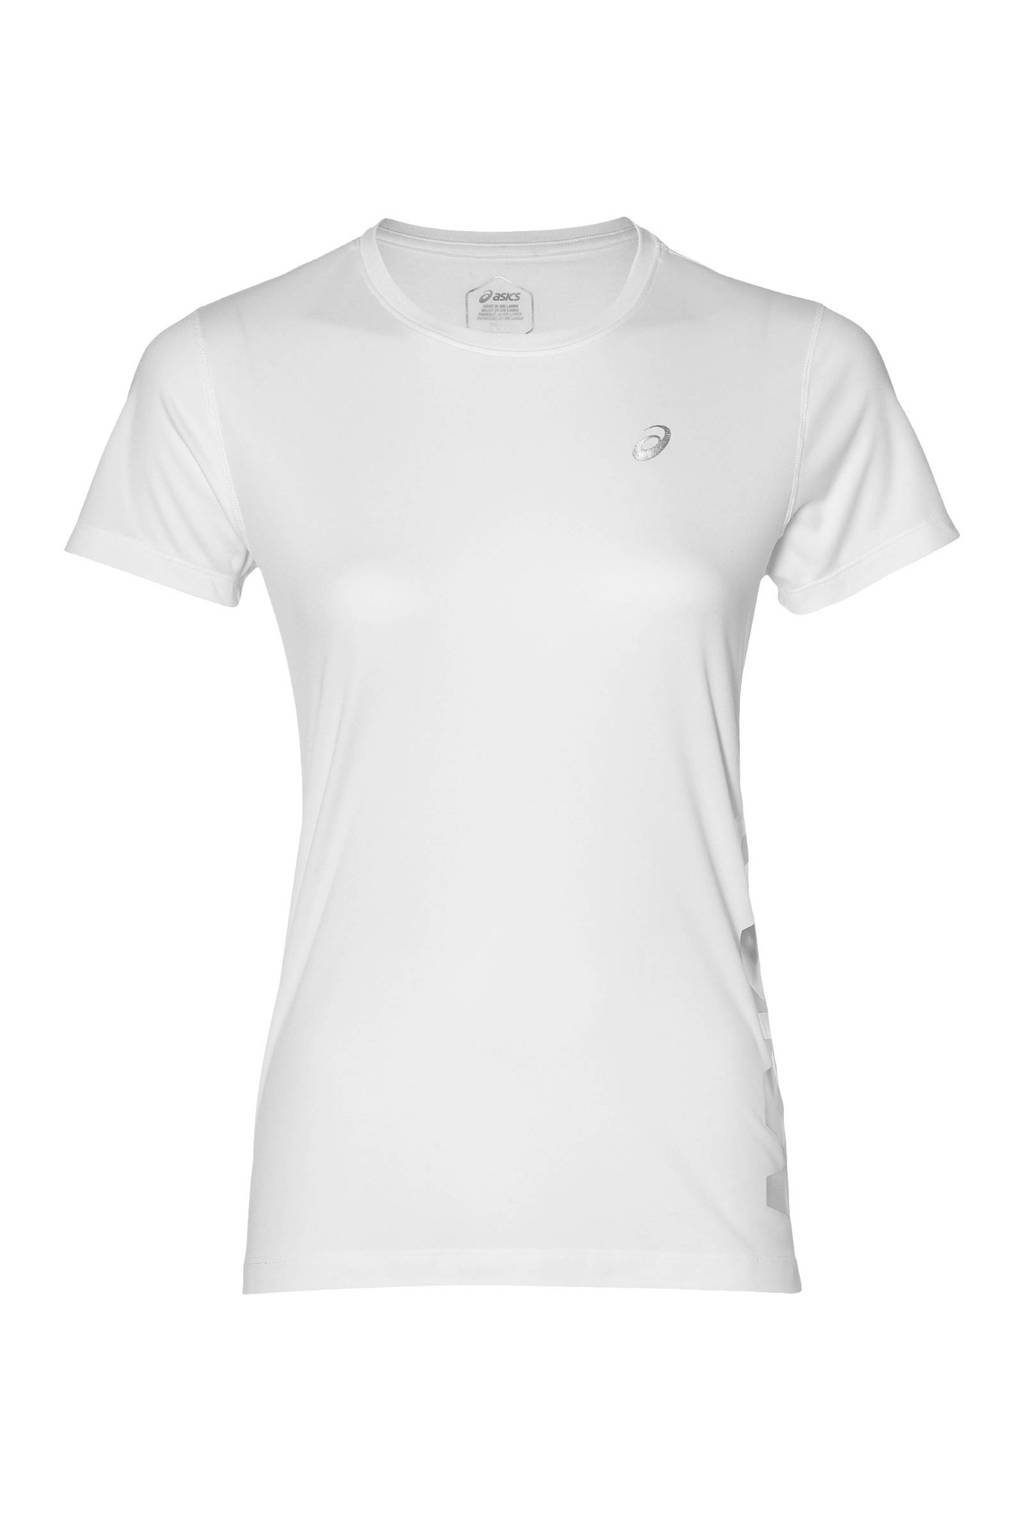 ASICS hardloop T-shirt wit, Wit/zilver